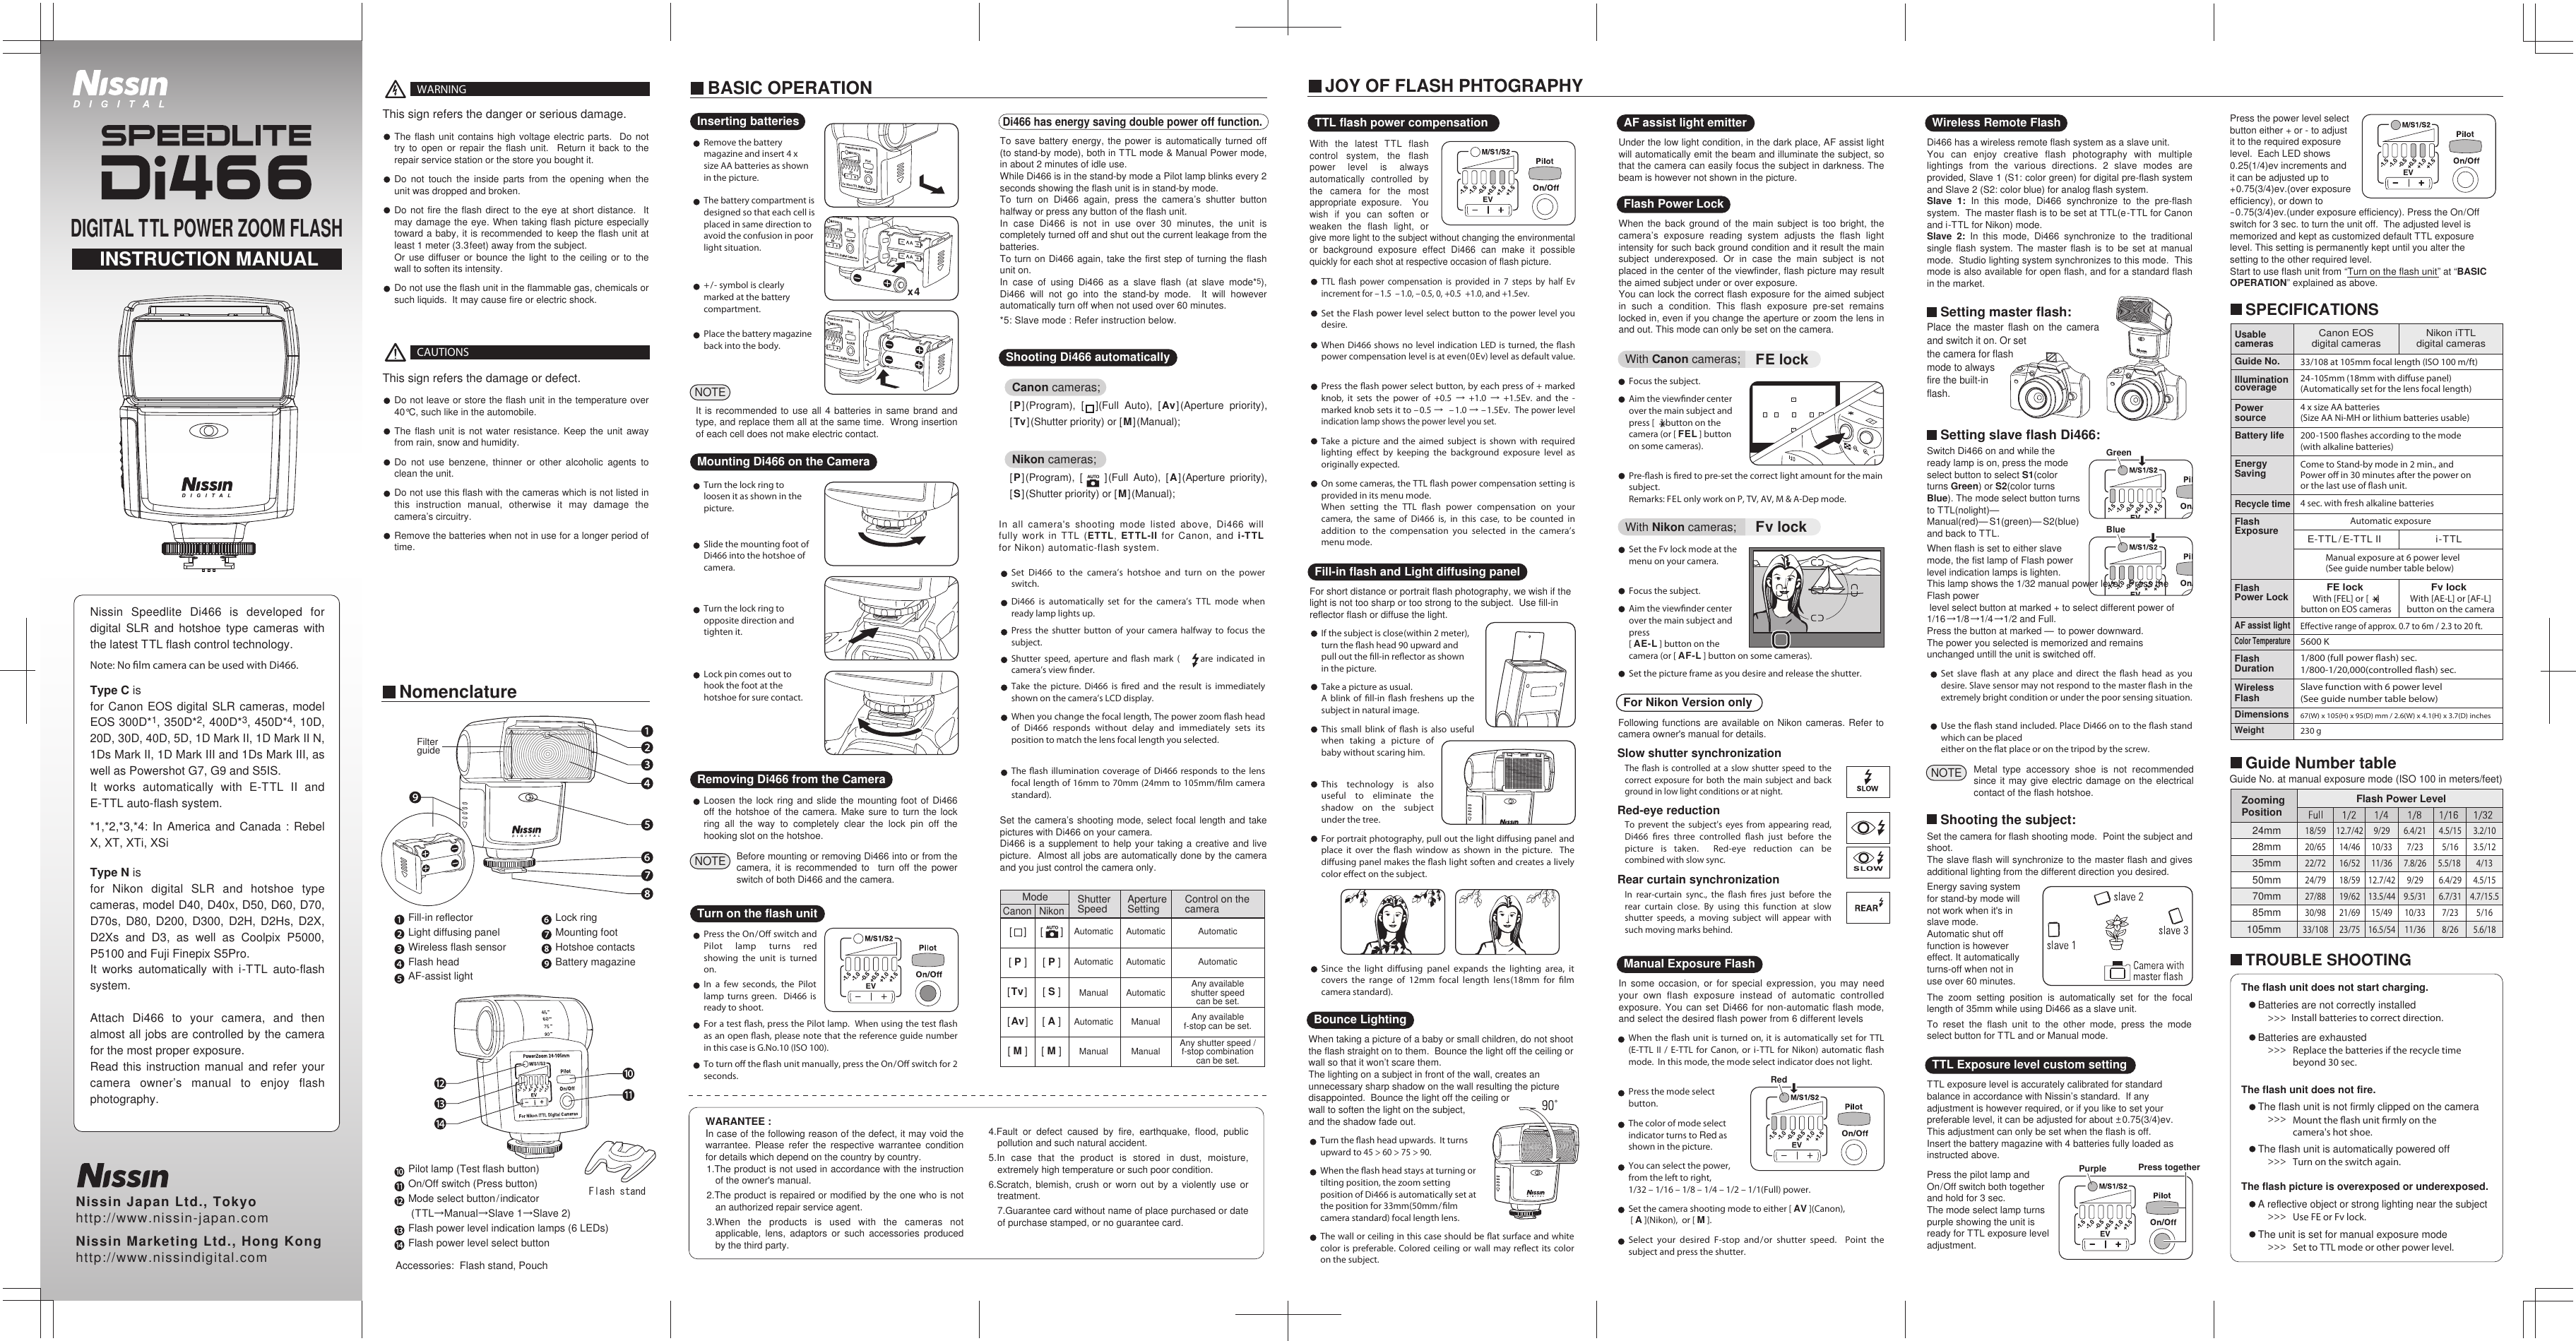 Nissin Di466 For Canon And Nikon Users Manual Di466_English